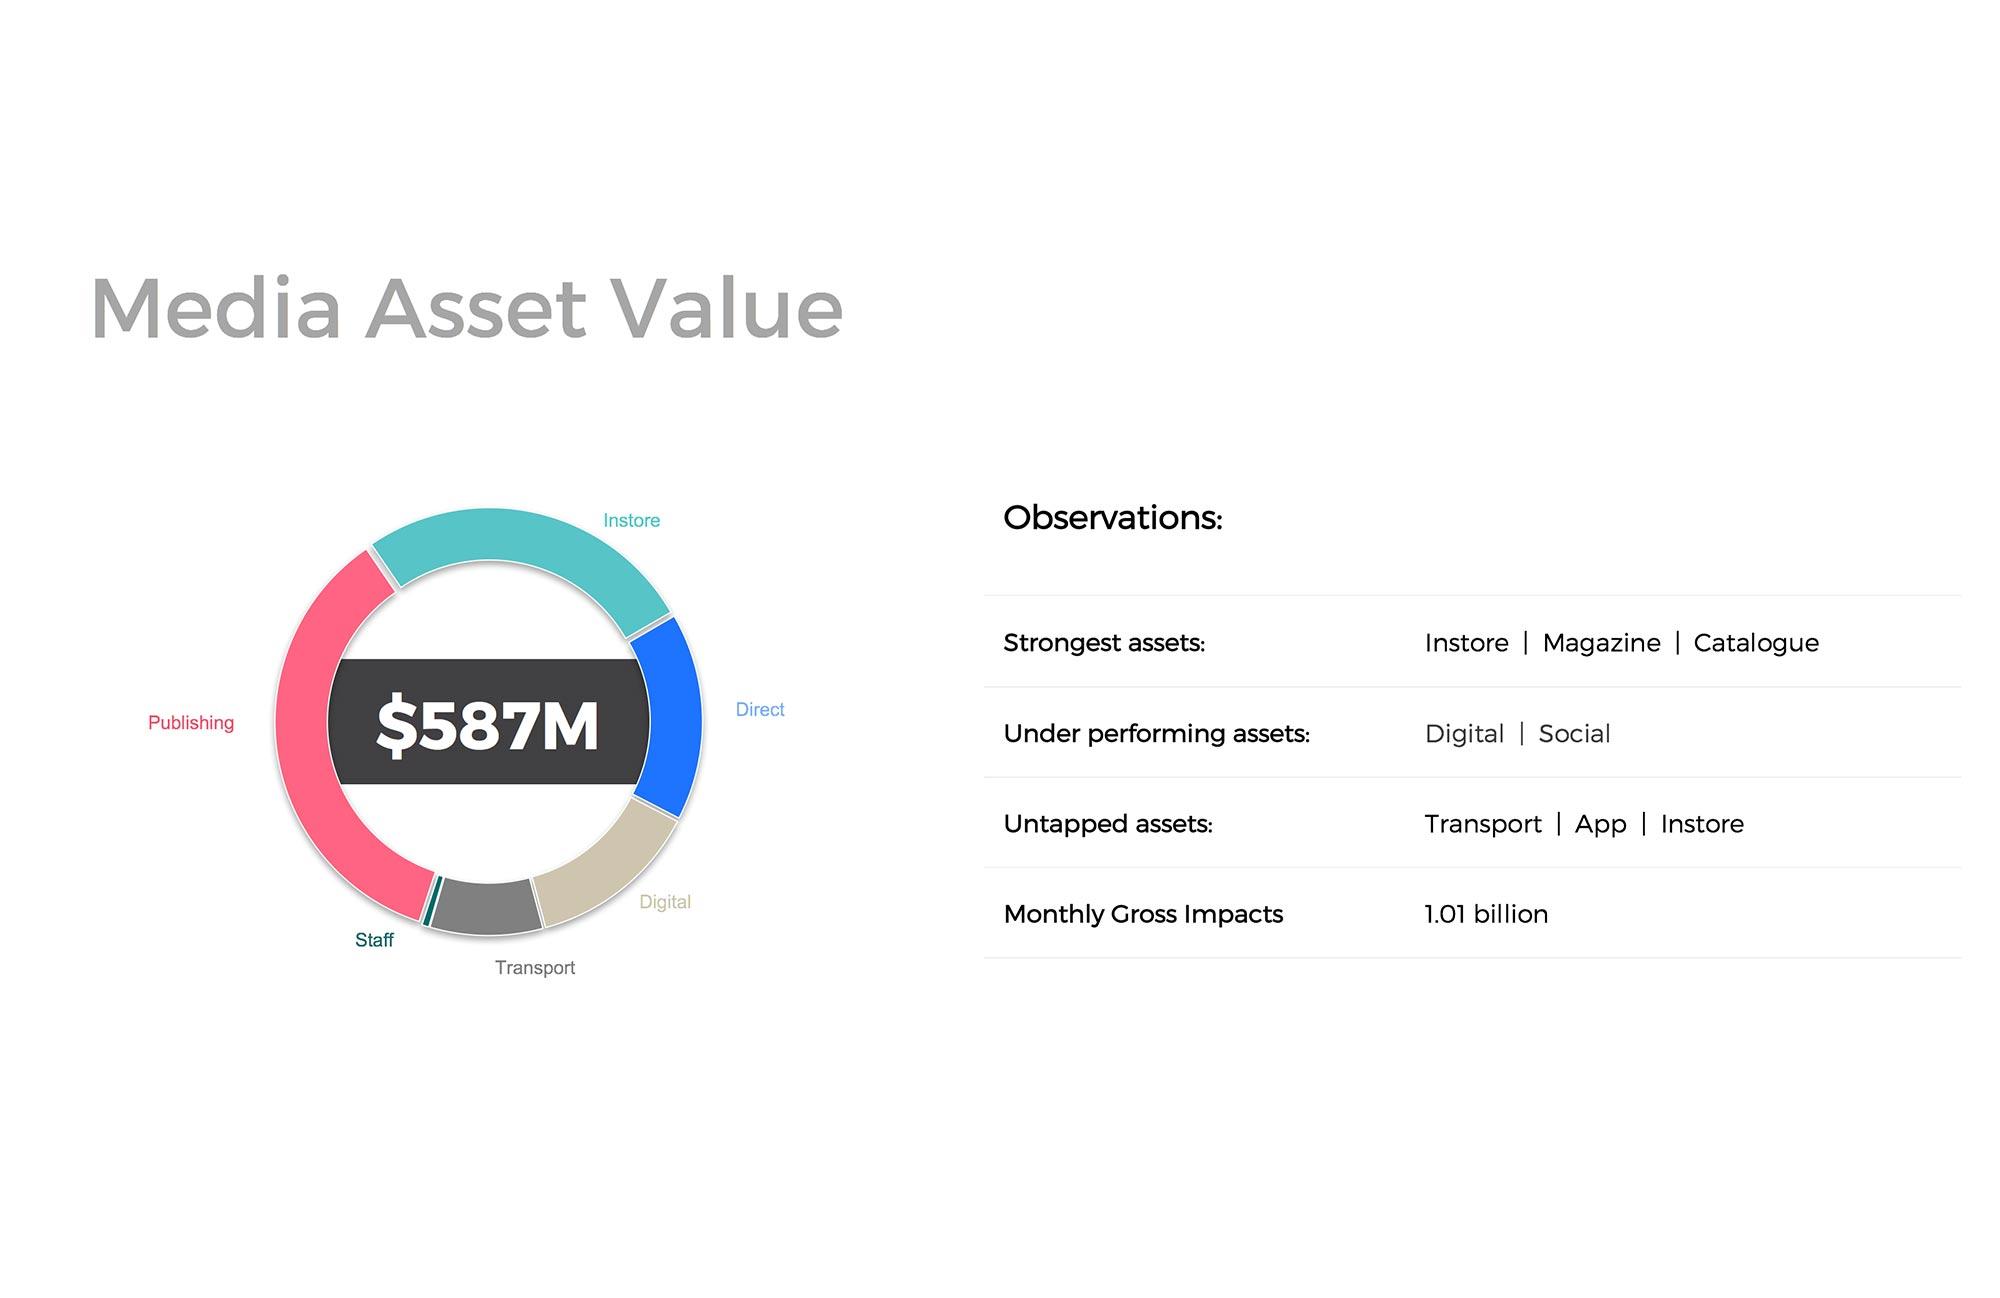 Media Asset Value and strategic observations